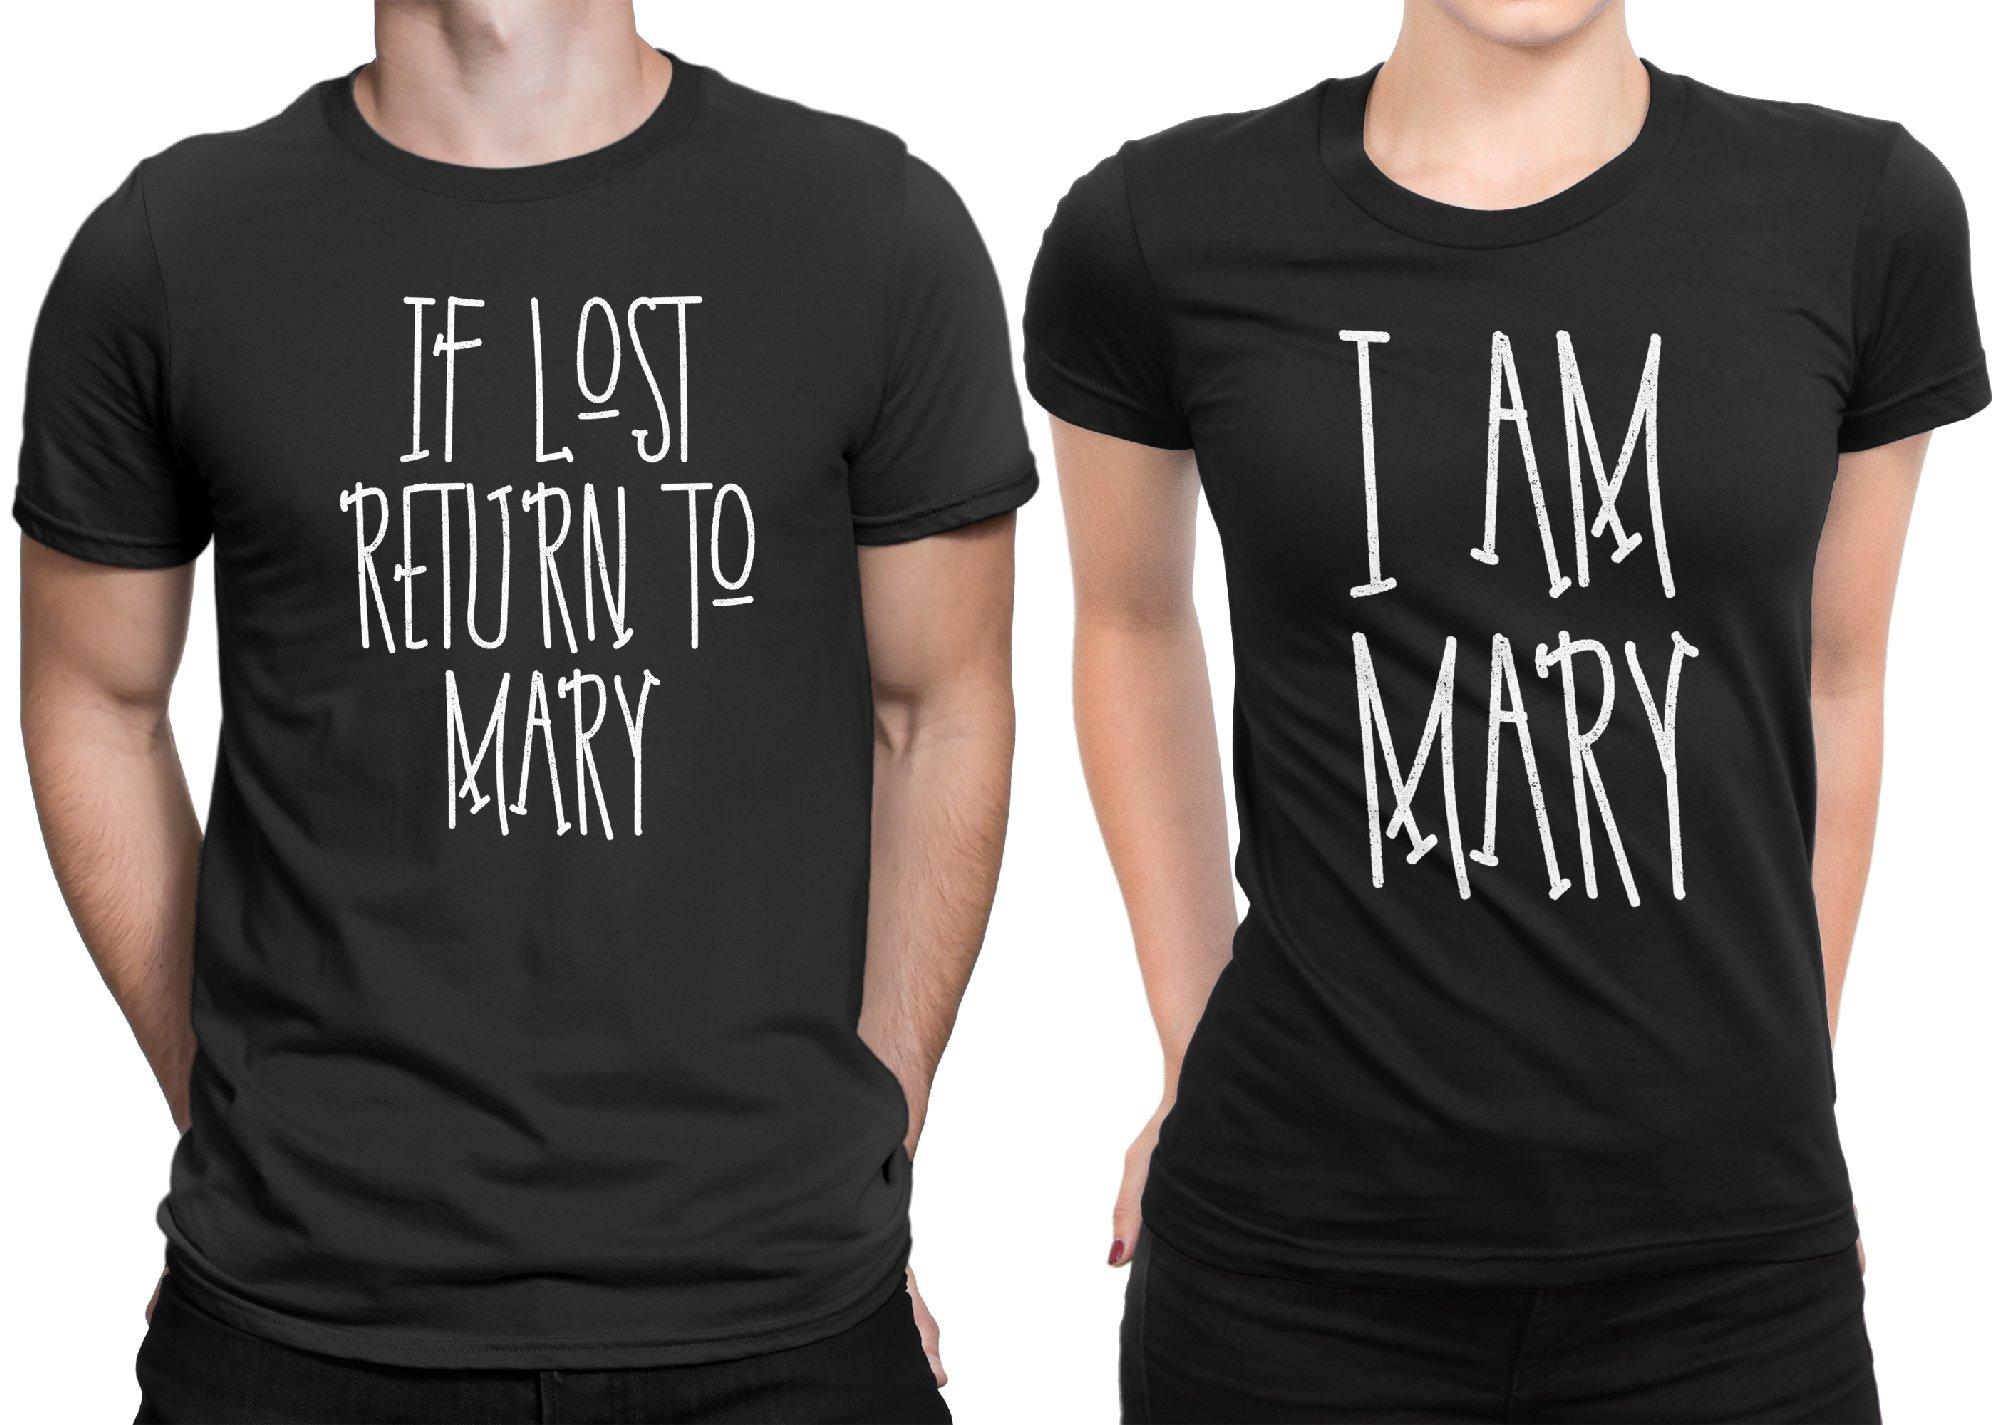 If Lost Return Mary - I am Mary Funny Couple Matching Honeymoon T-shirt Married Men Medium / Women Small | Black - Black